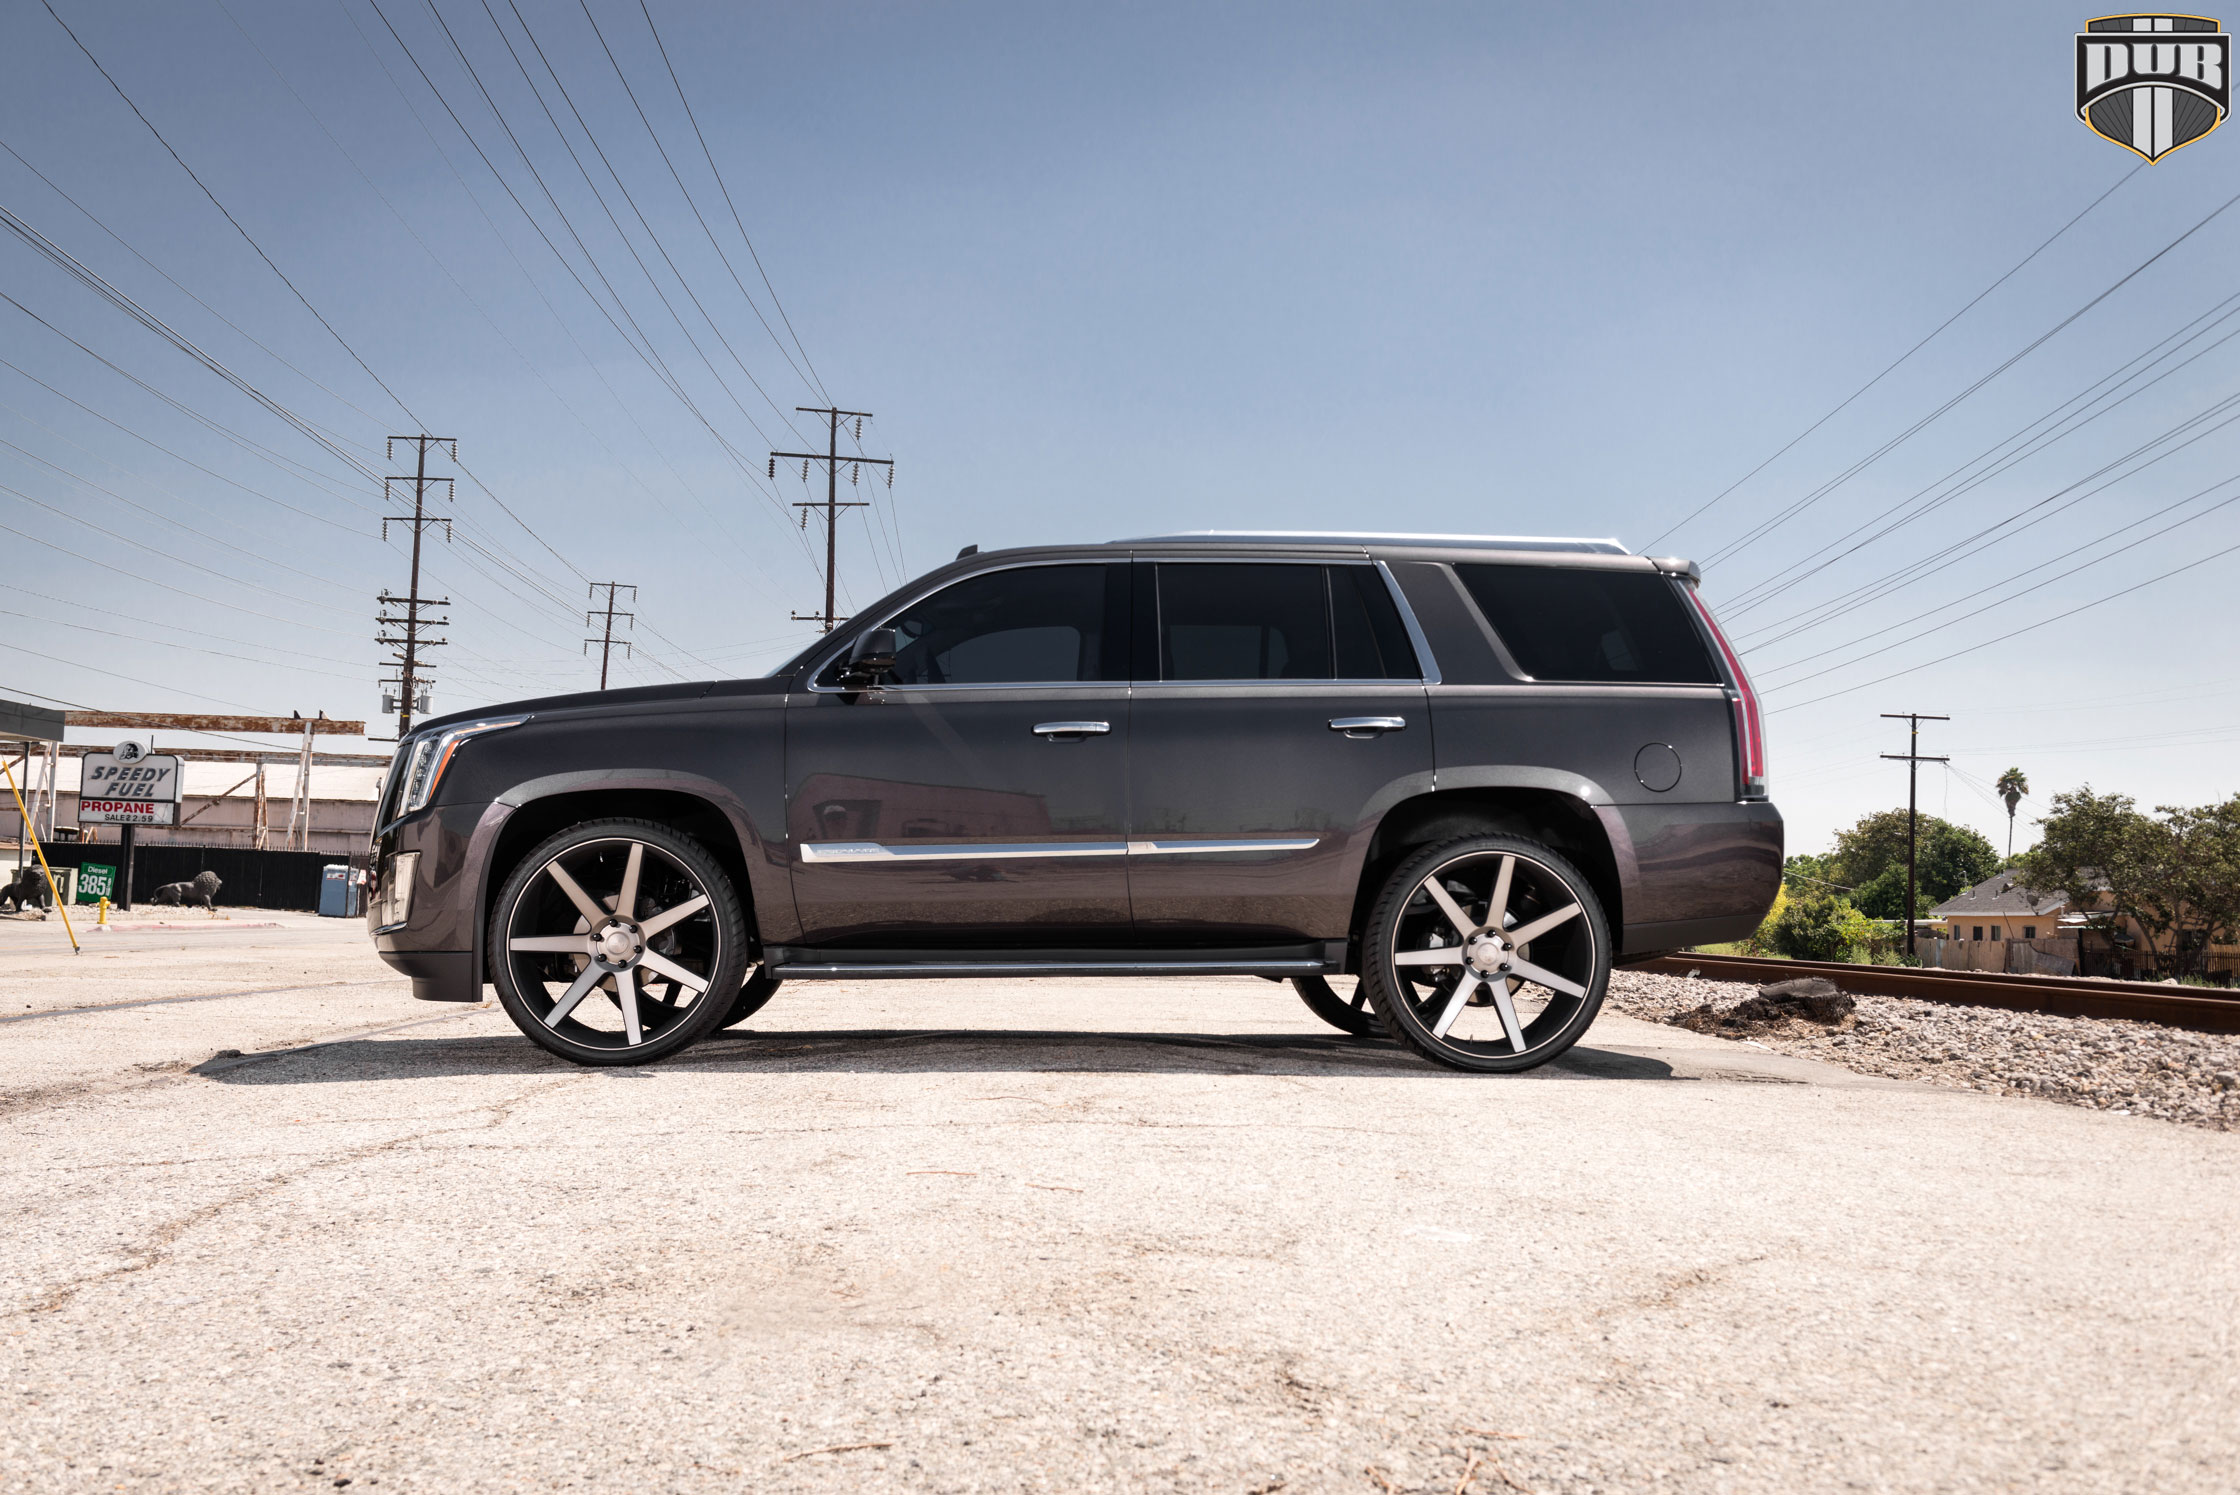 Car Cadillac Escalade On Dub 1 Piece Future S127 Wheels